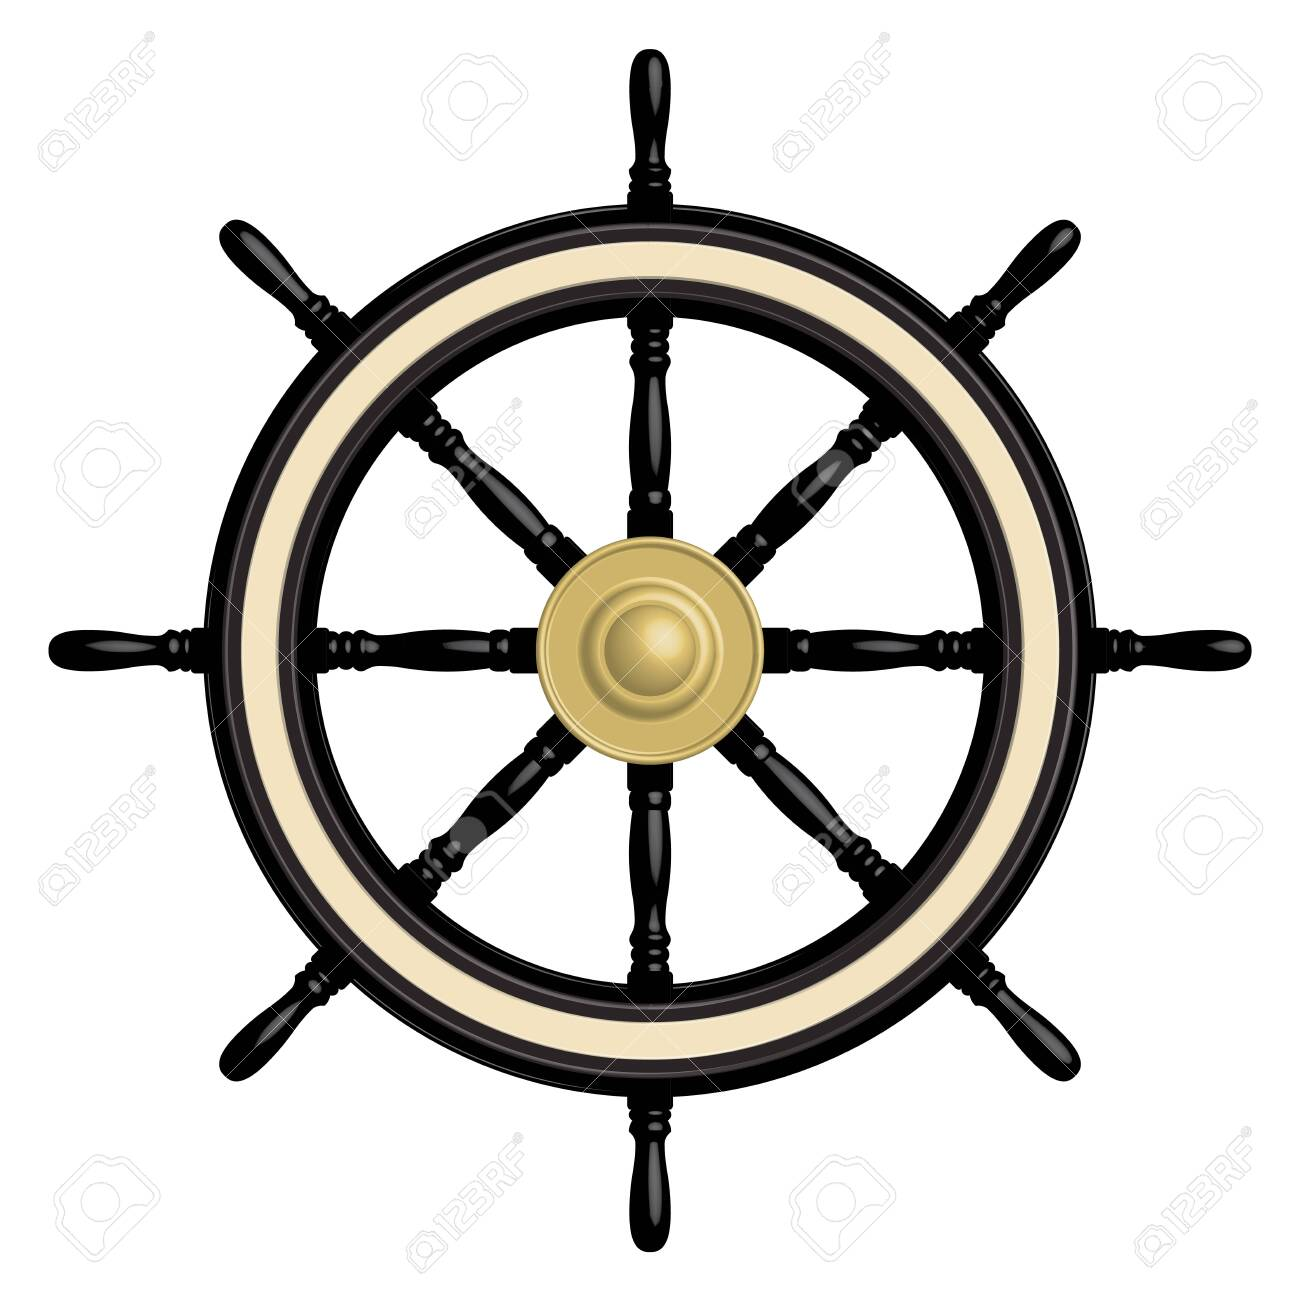 8 spoke black ship steering wheel. 3D effect vector - 144695346